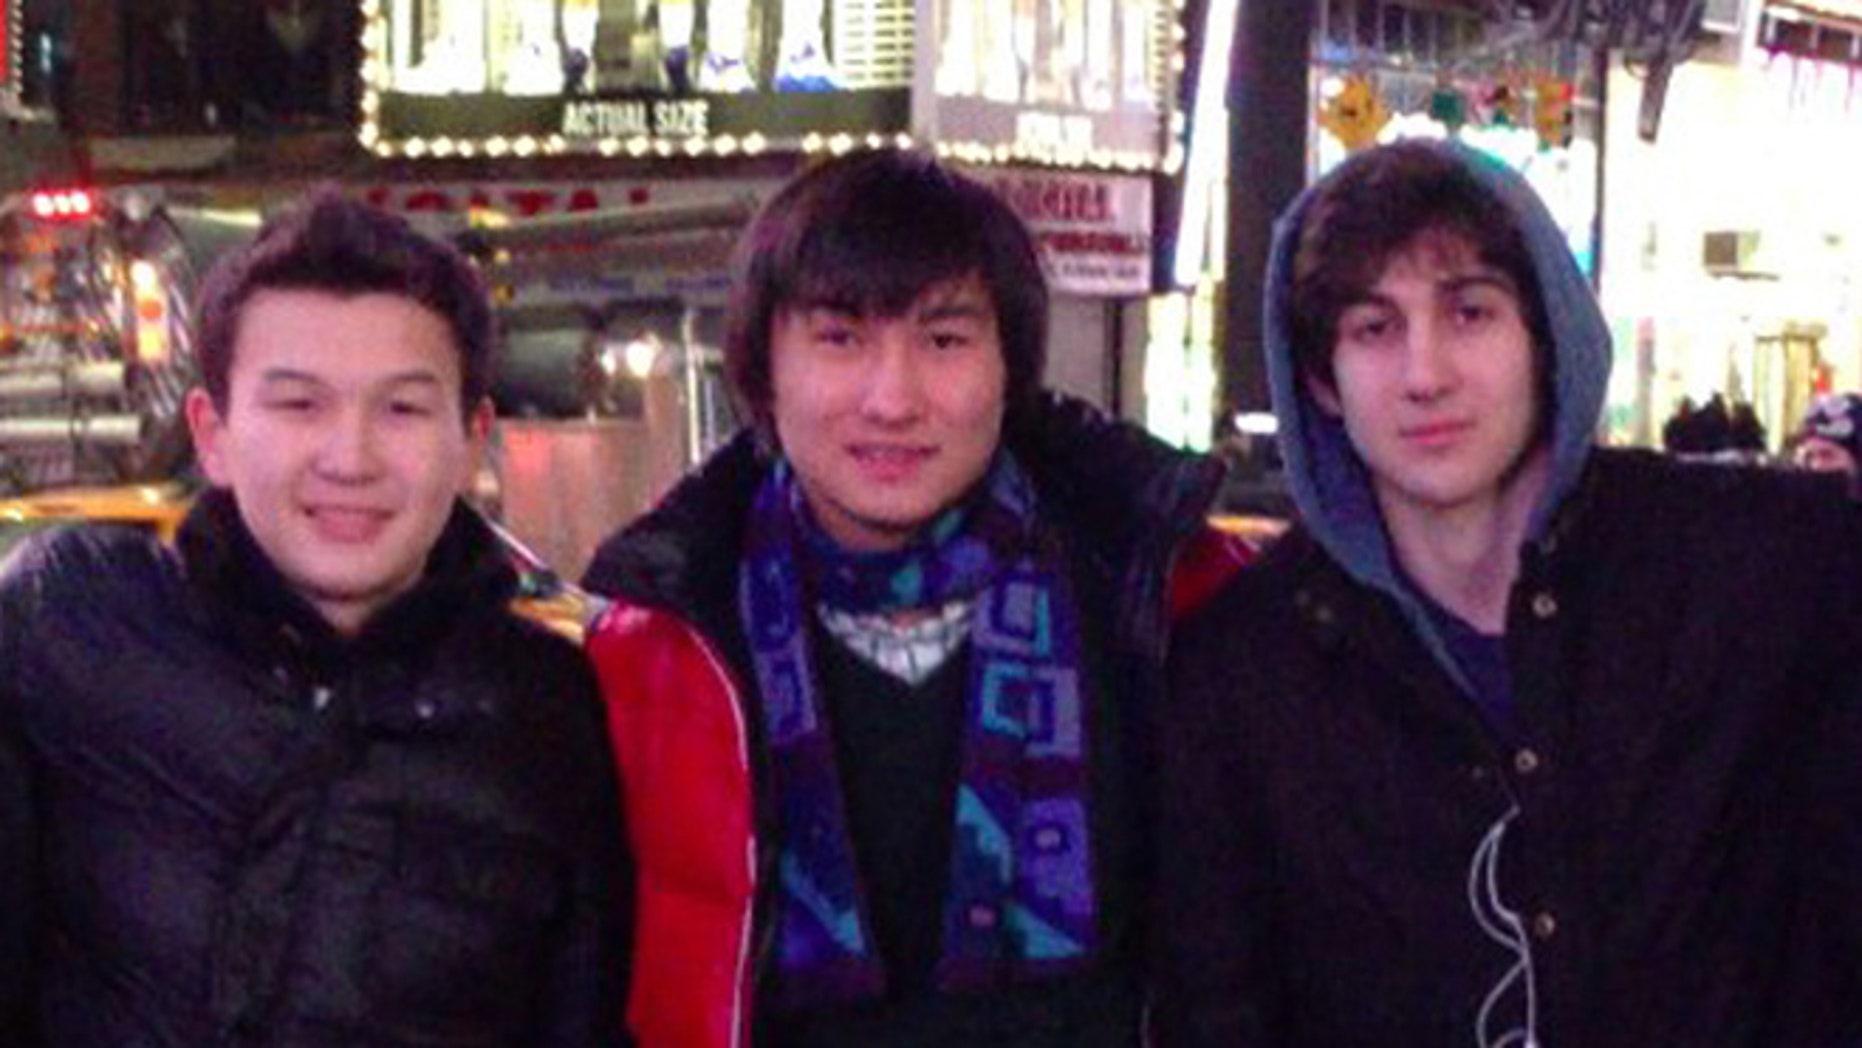 Azamat Tazhayakov, left, Kadyrbayev, center, and Dzhokhar Tsarnaev are seen in this undated photo. Tazhavakov was convicted of obstructing justice in the bombing investigation.